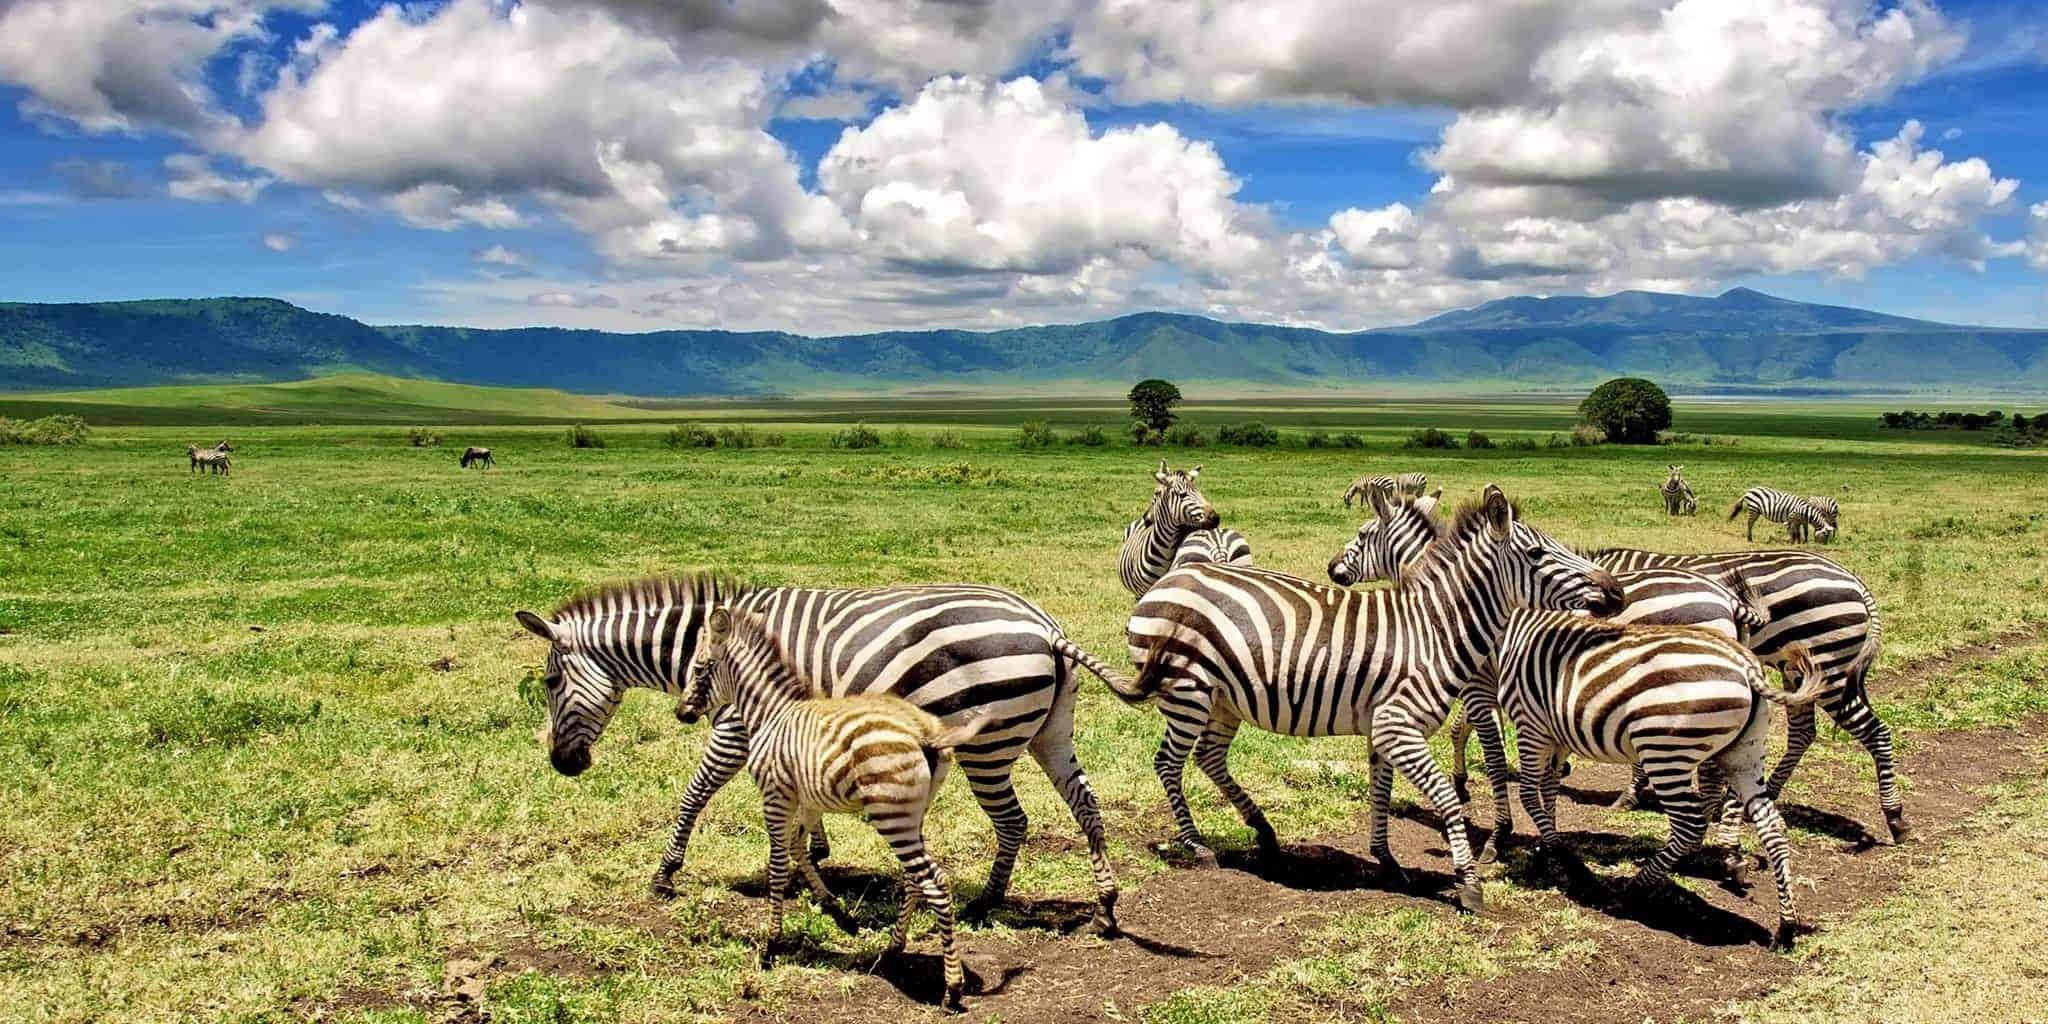 Zebra at Ngorongoro Crater